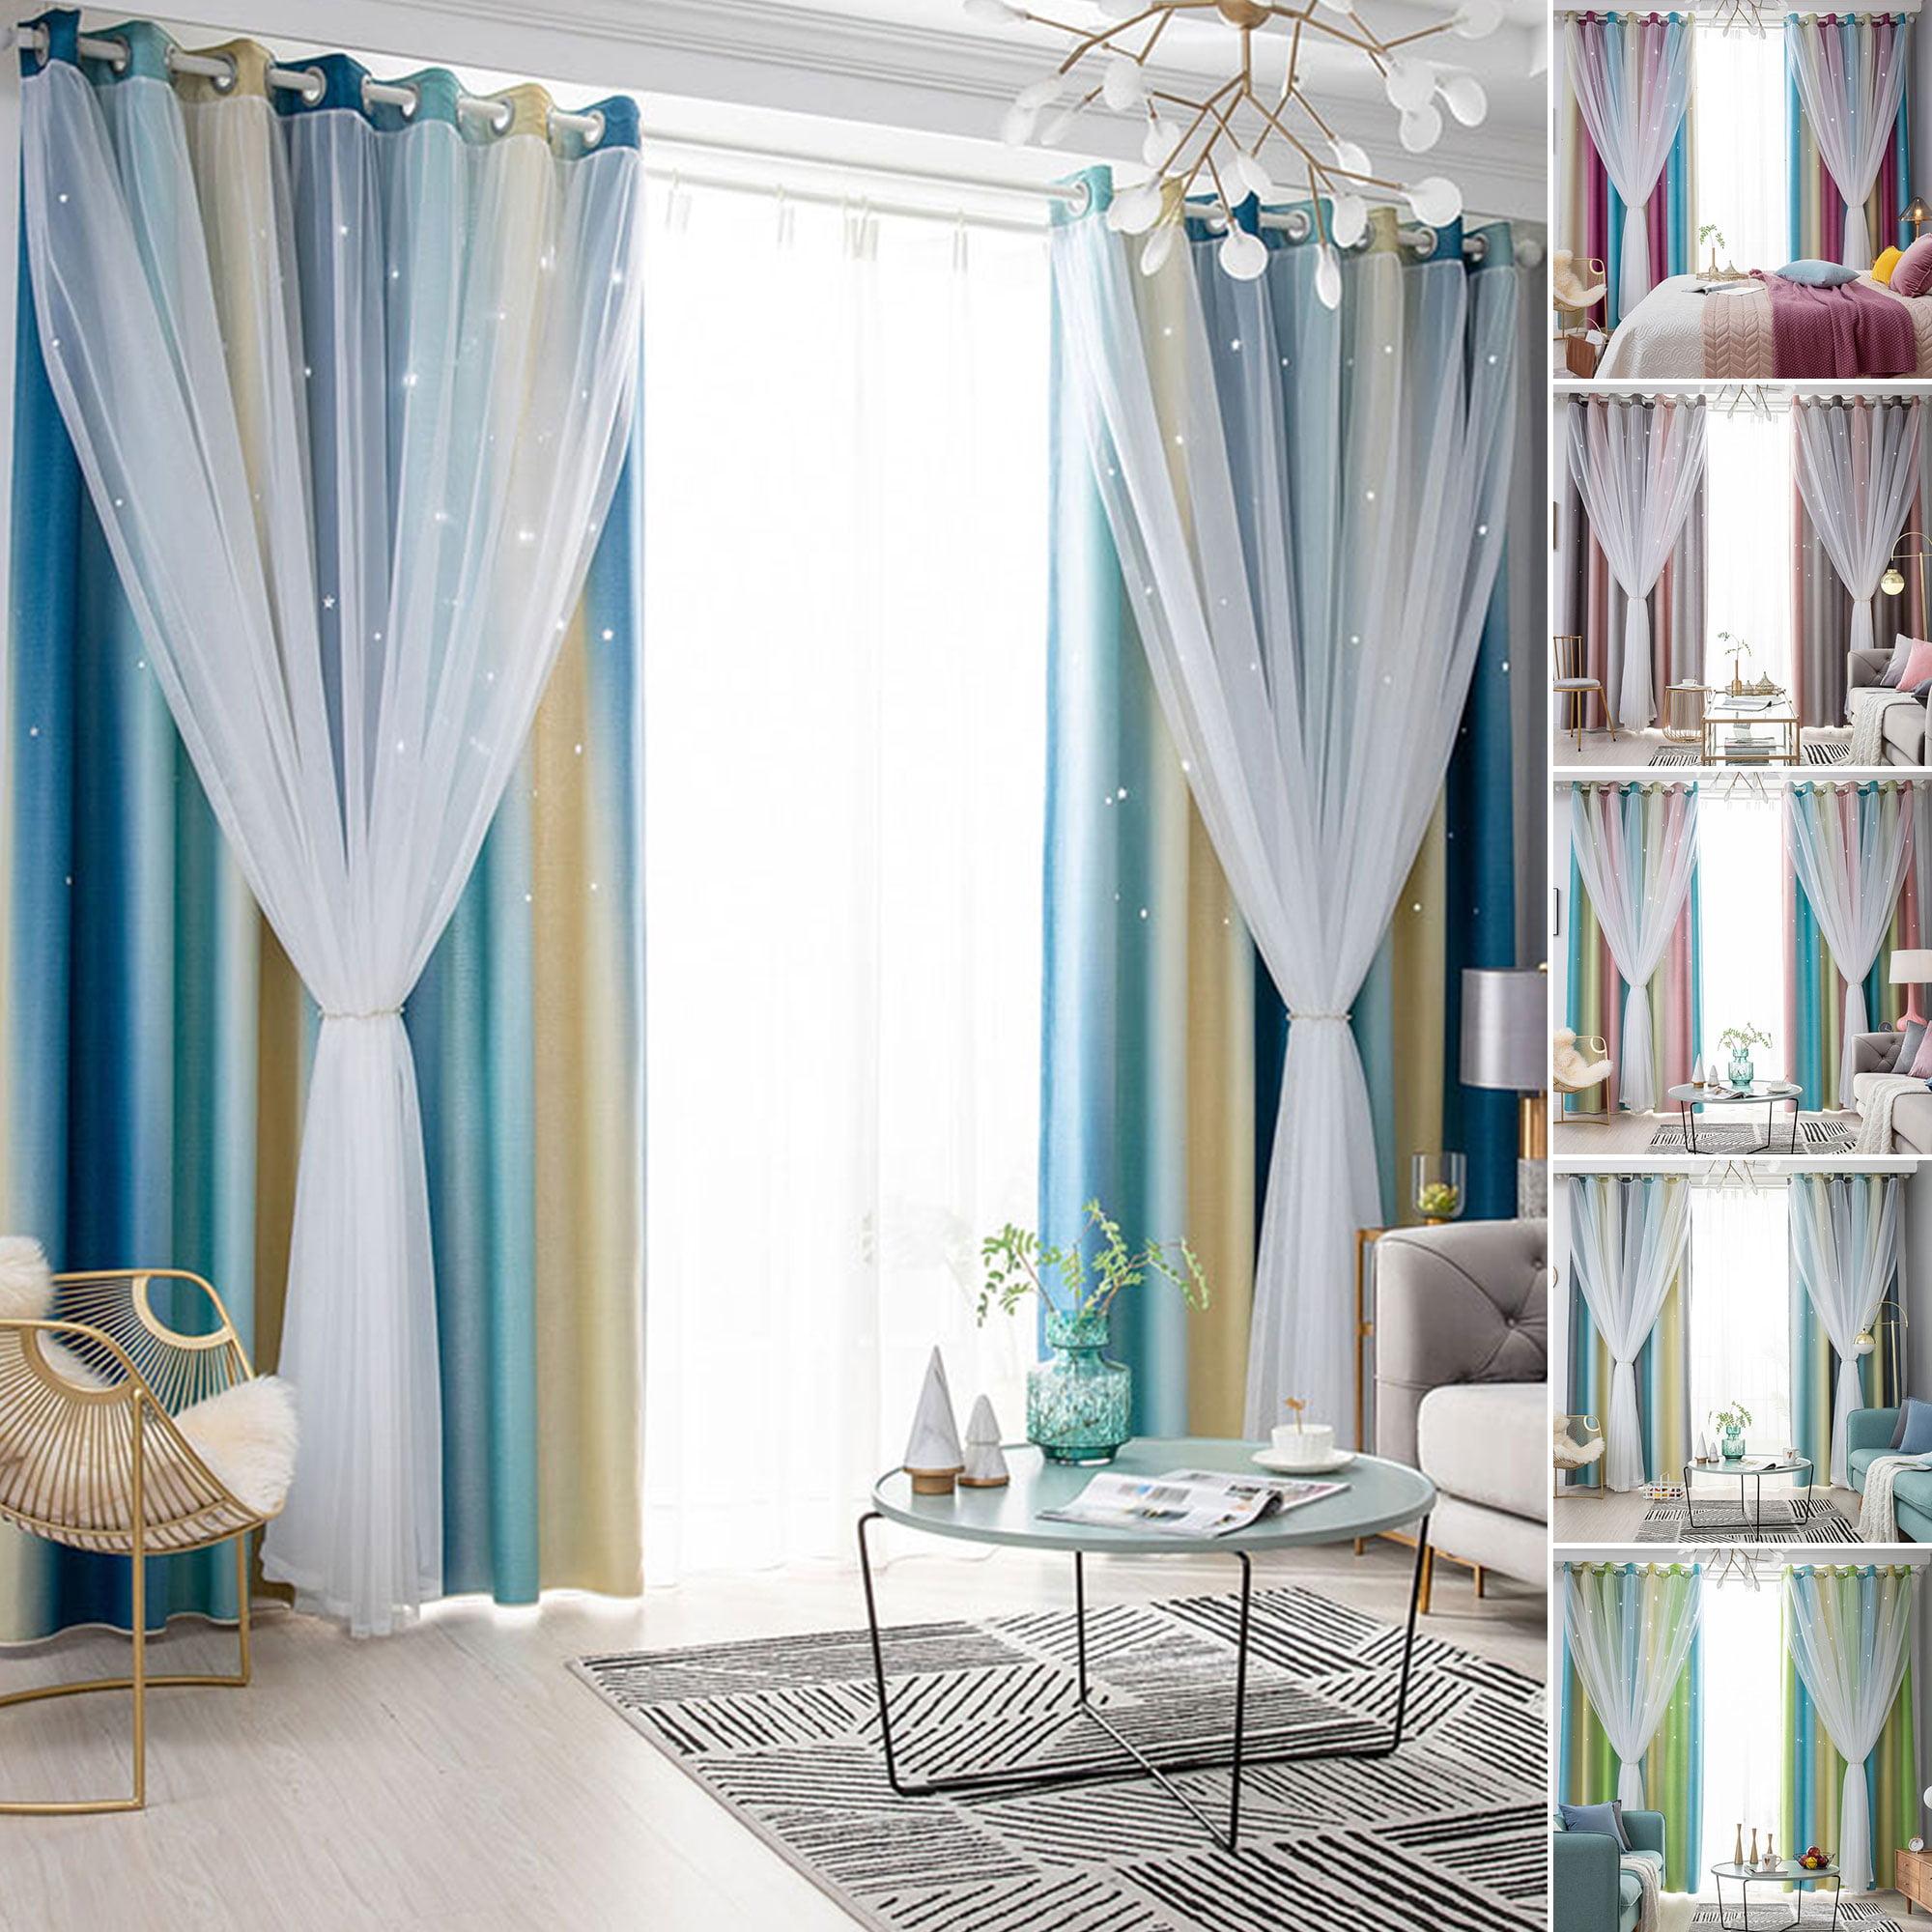 Starry Sky Blackout Sheer Curtains Girls Double Layer Home Floor Curtain Bedroom Walmart Com Walmart Com